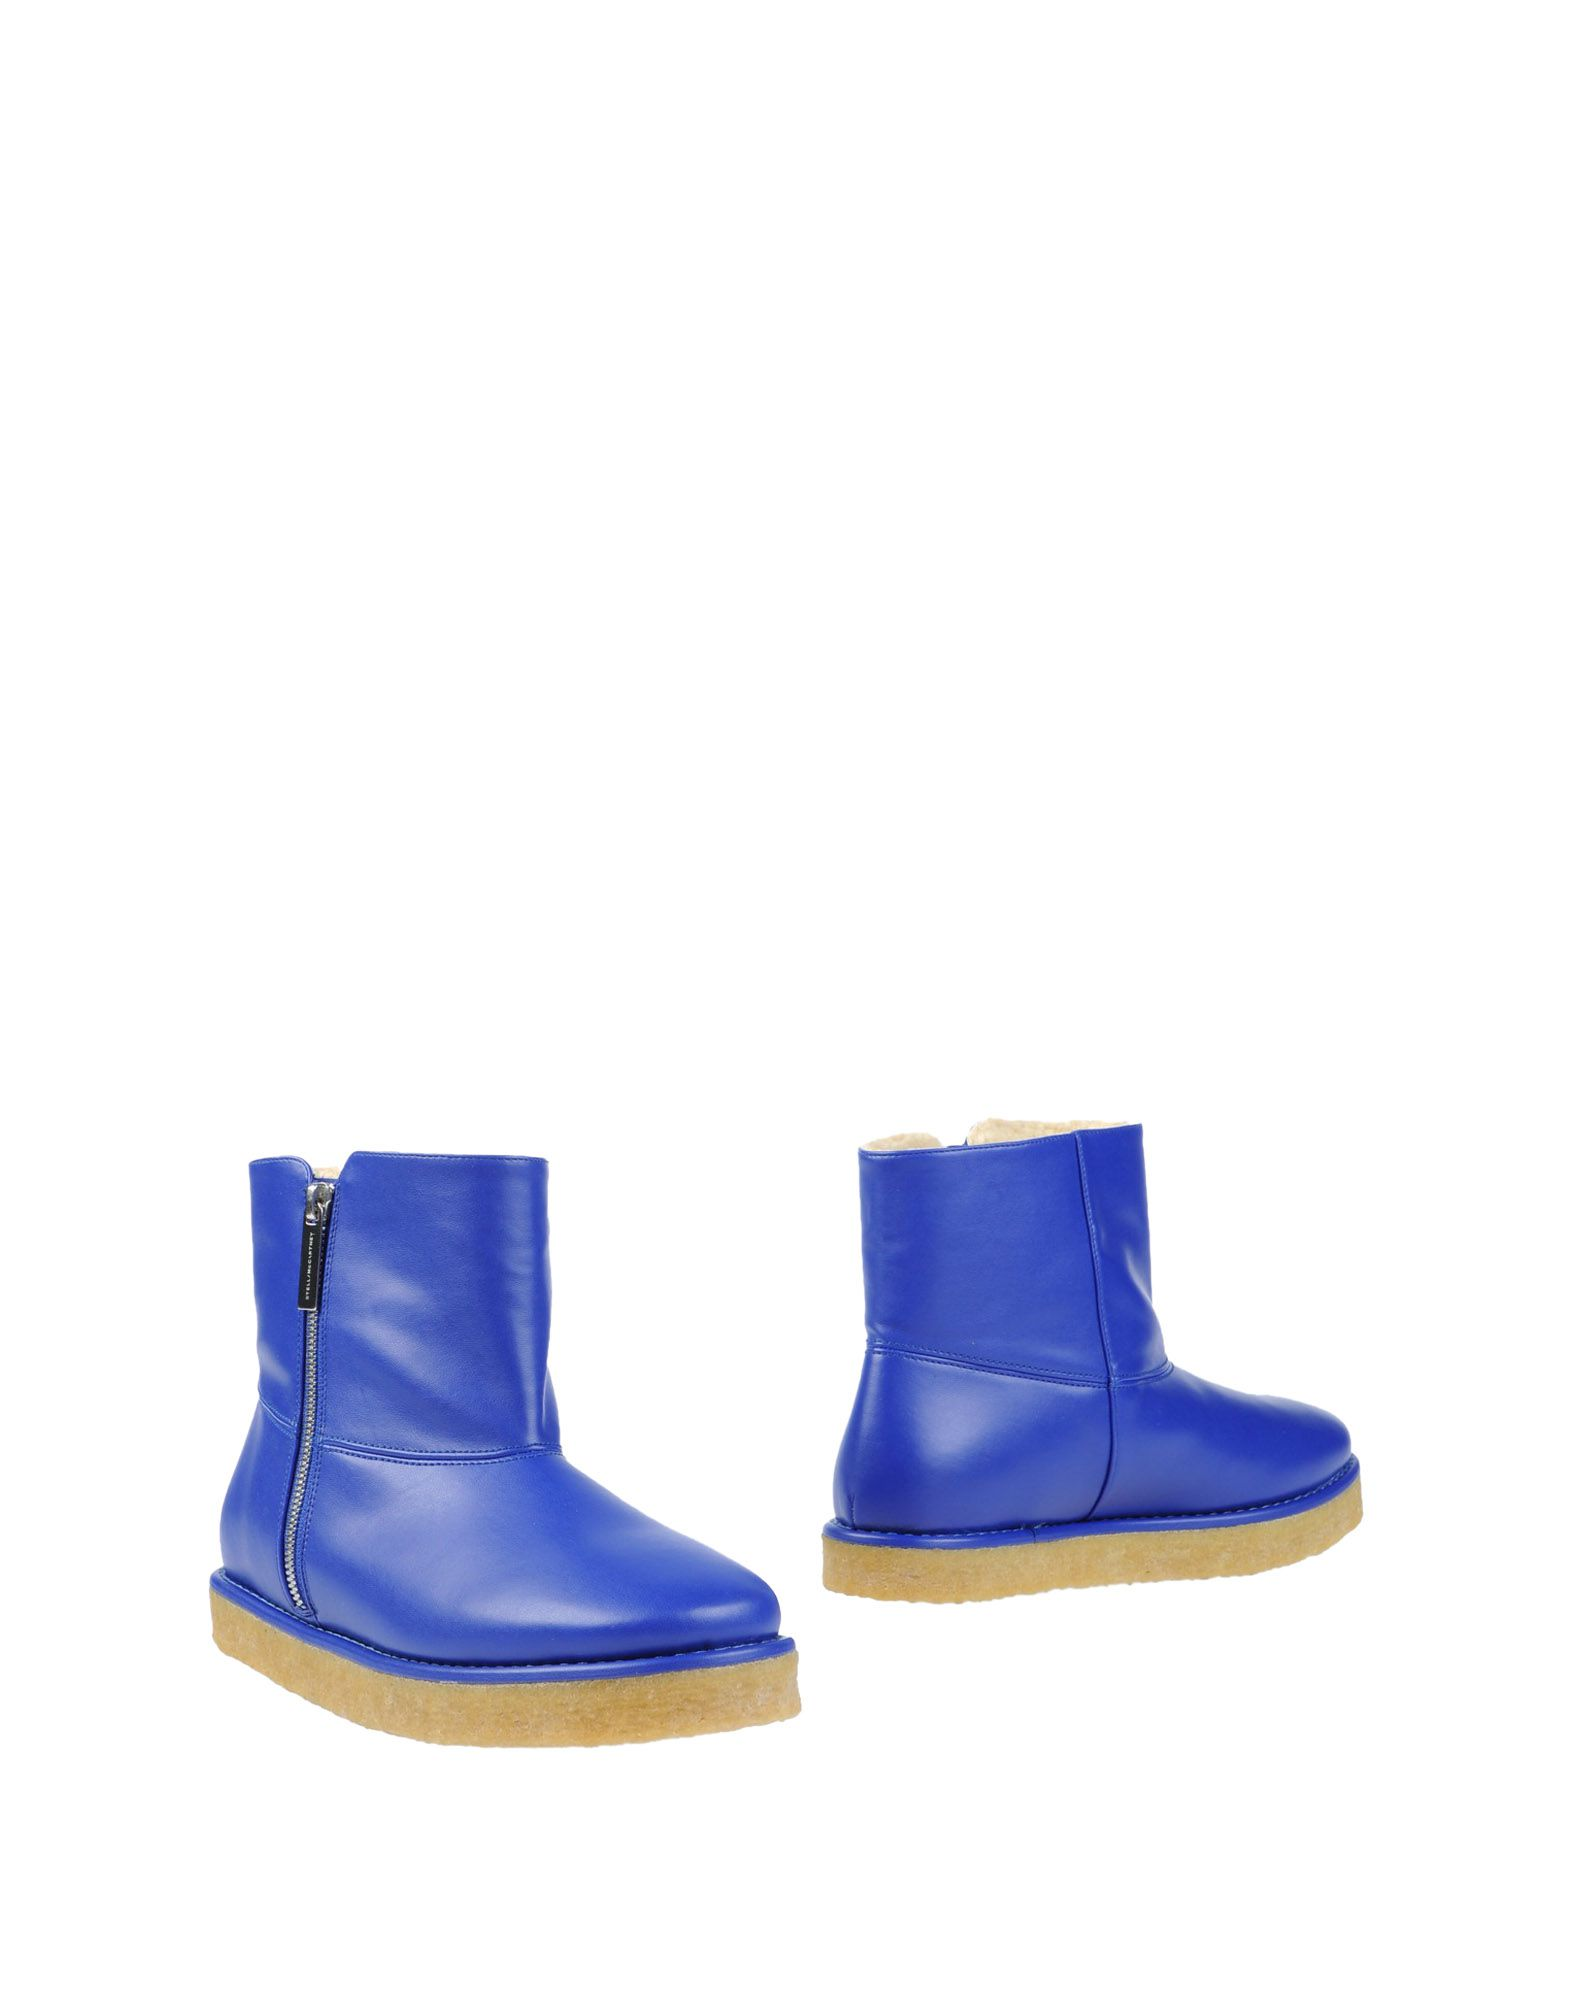 Bottine Stella Mccartney Femme - Bottines Stella Mccartney Jaune Chaussures femme pas cher homme et femme